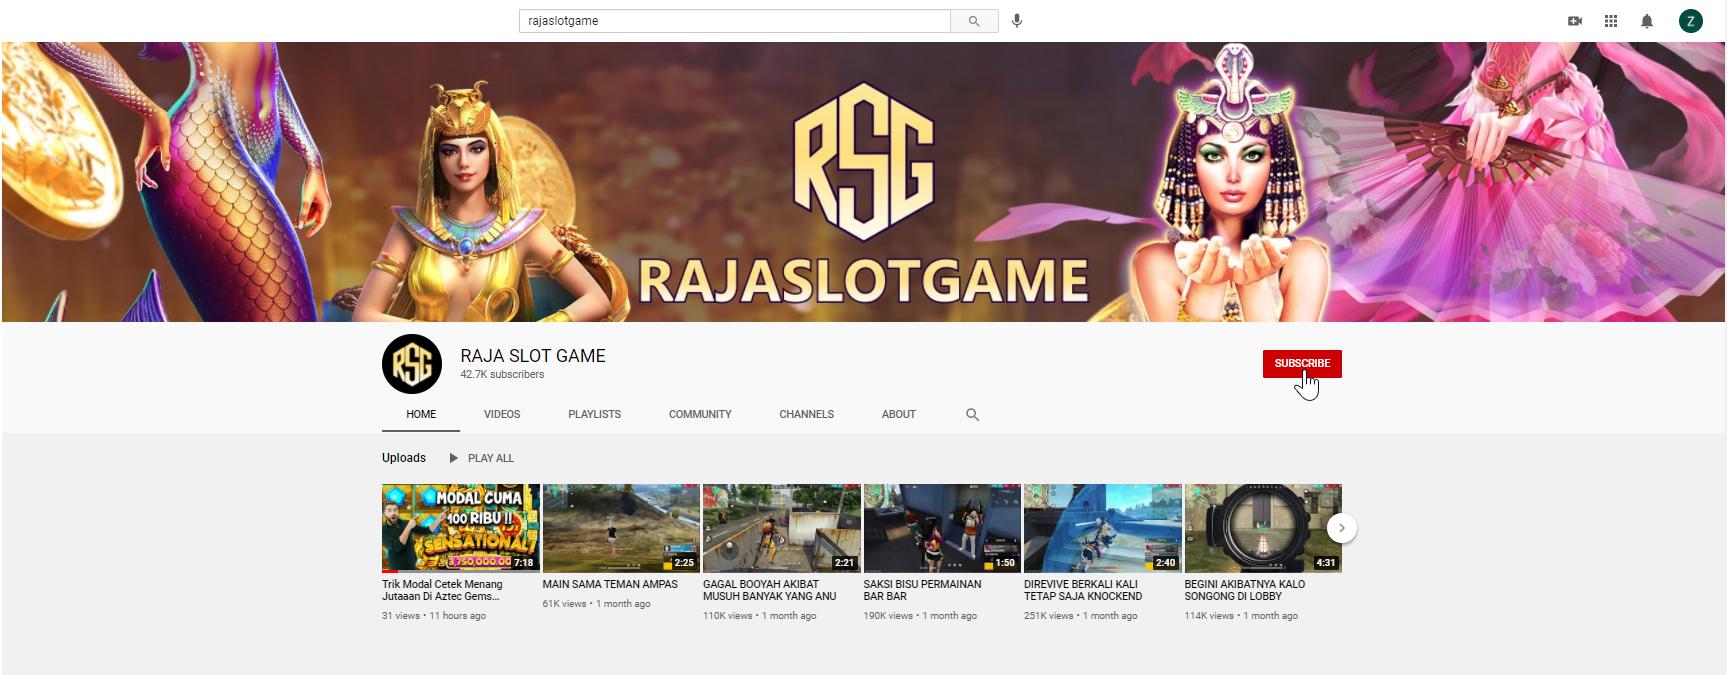 wajib subscribe channel youtube kita